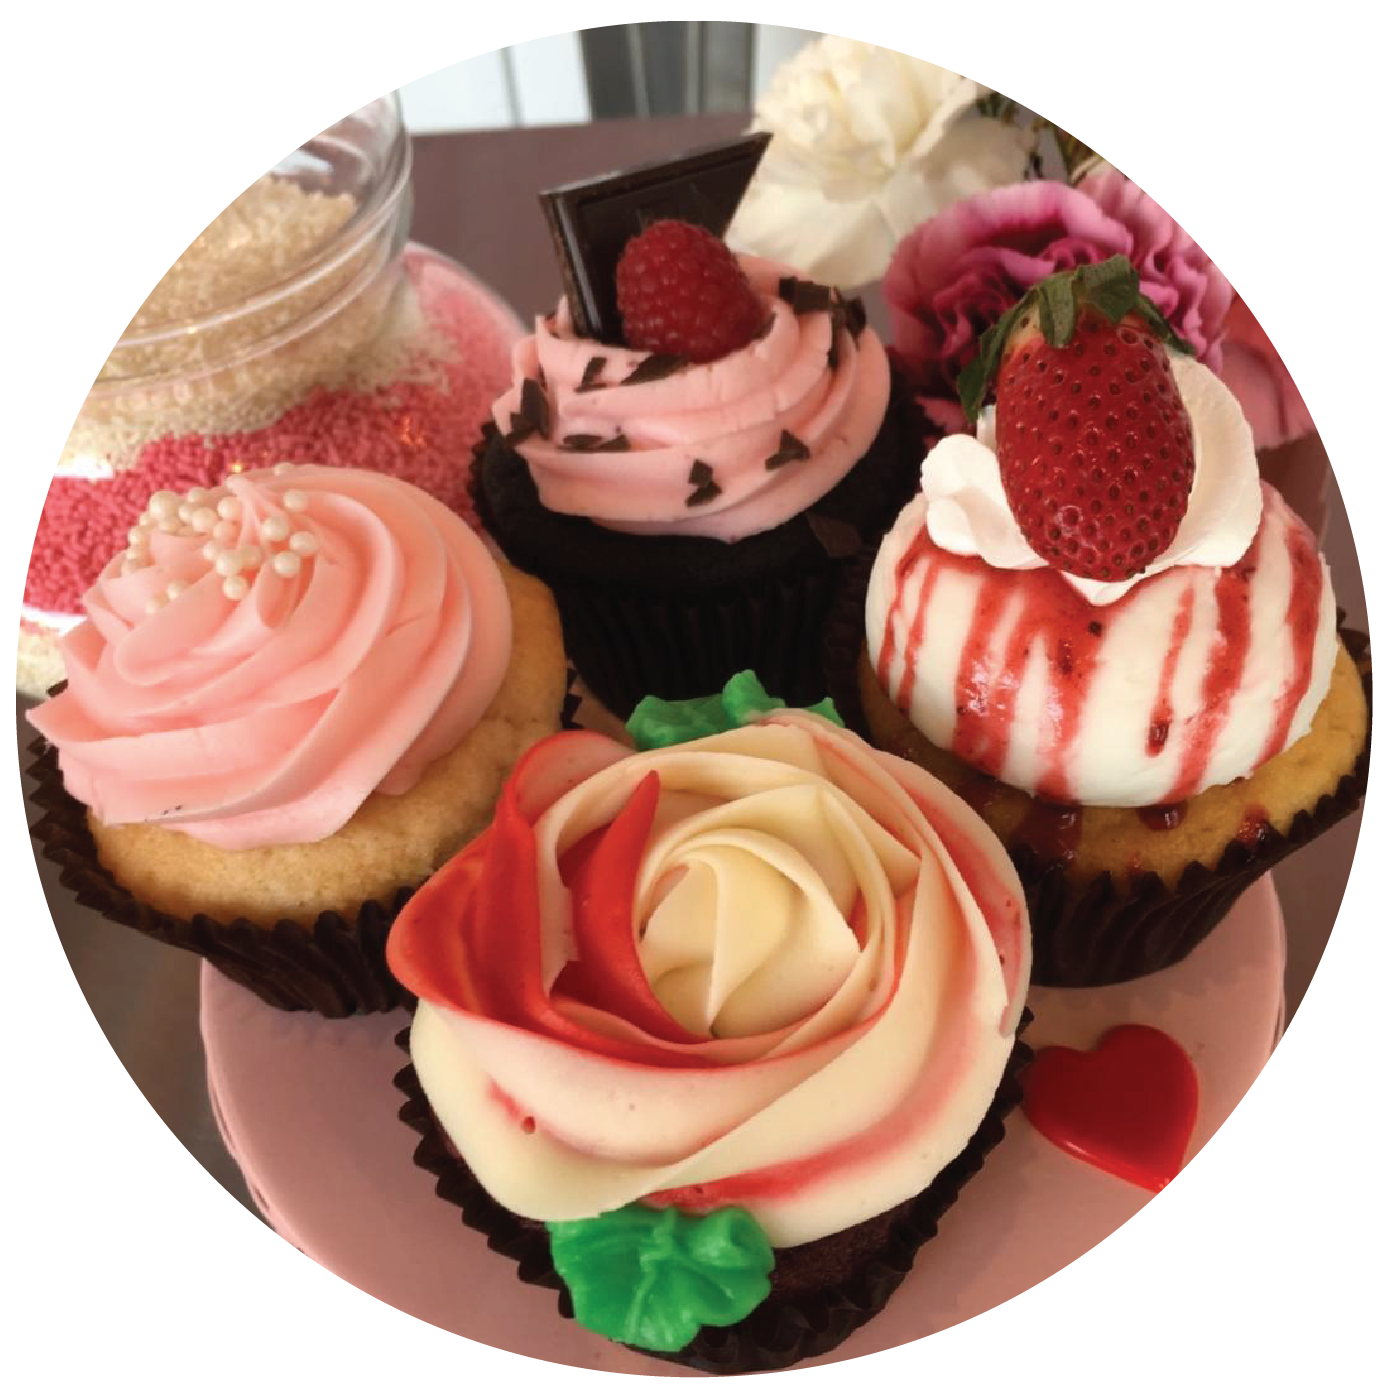 smallcakes-nc-valentines